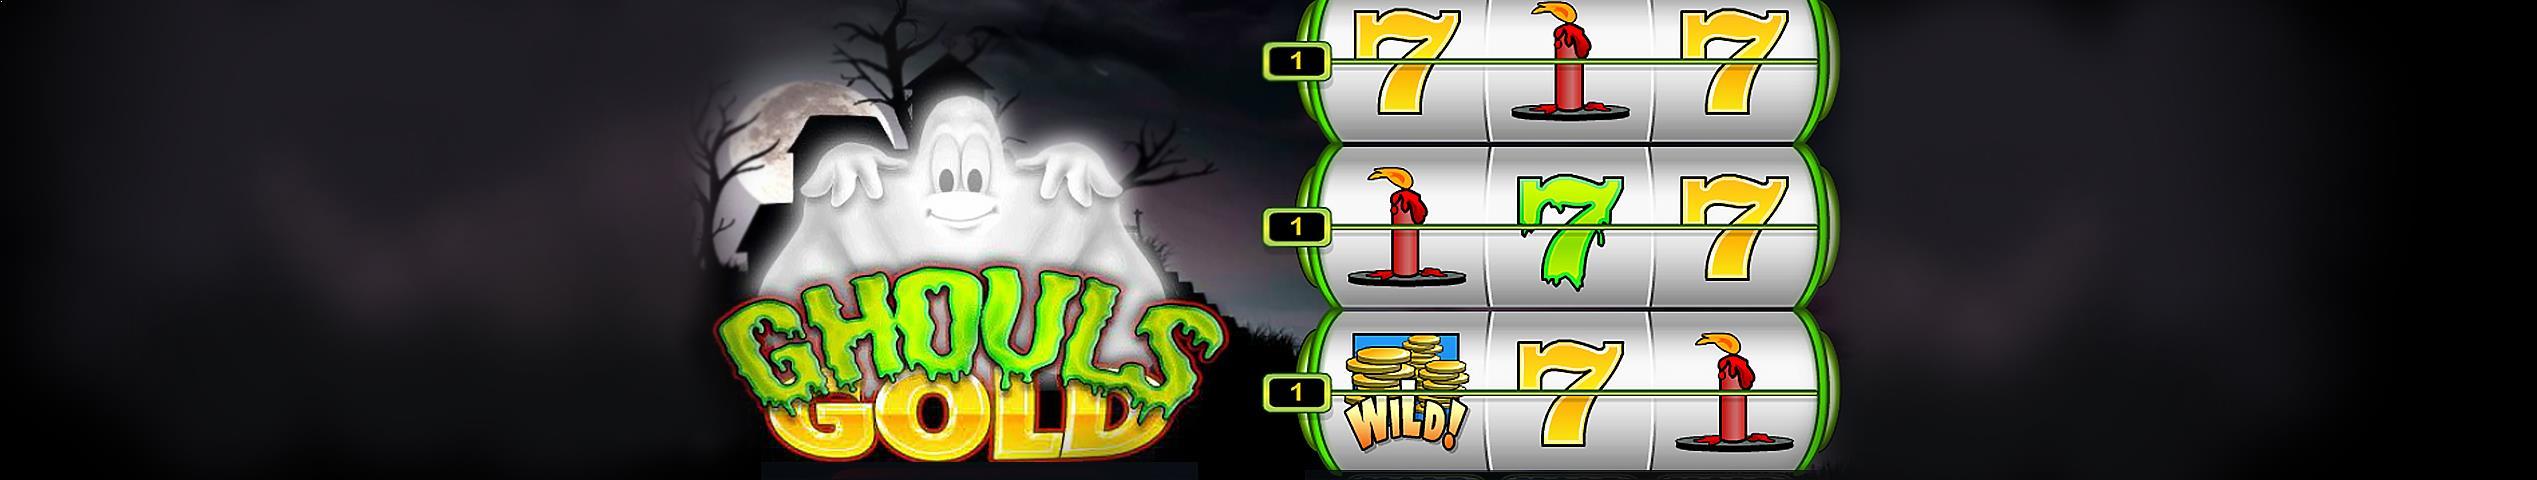 Ghouls Gold betsoft jocuri slot slider